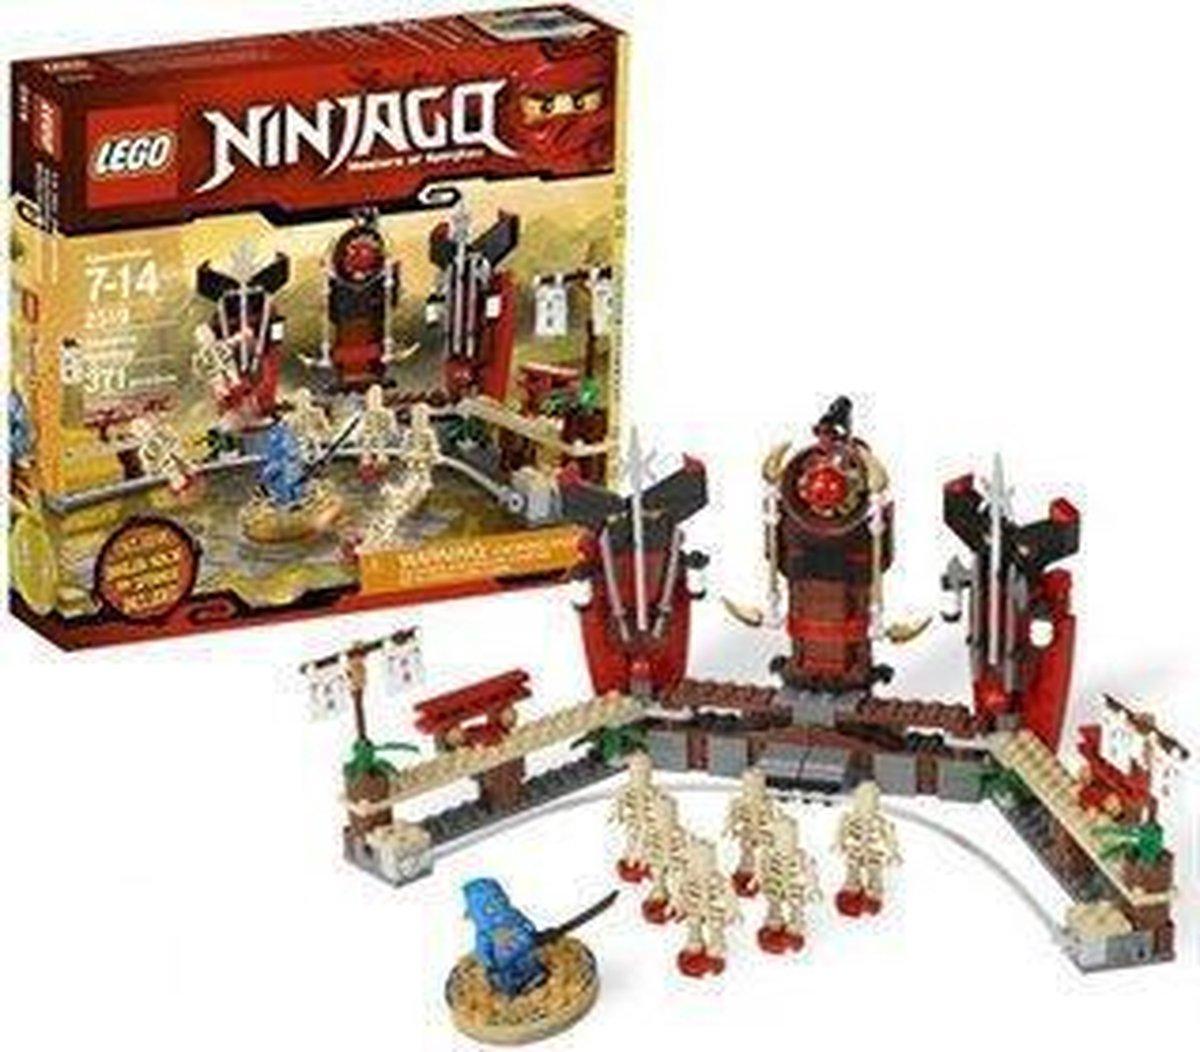 Lego Ninjago: masters of spinjitzu (2519)